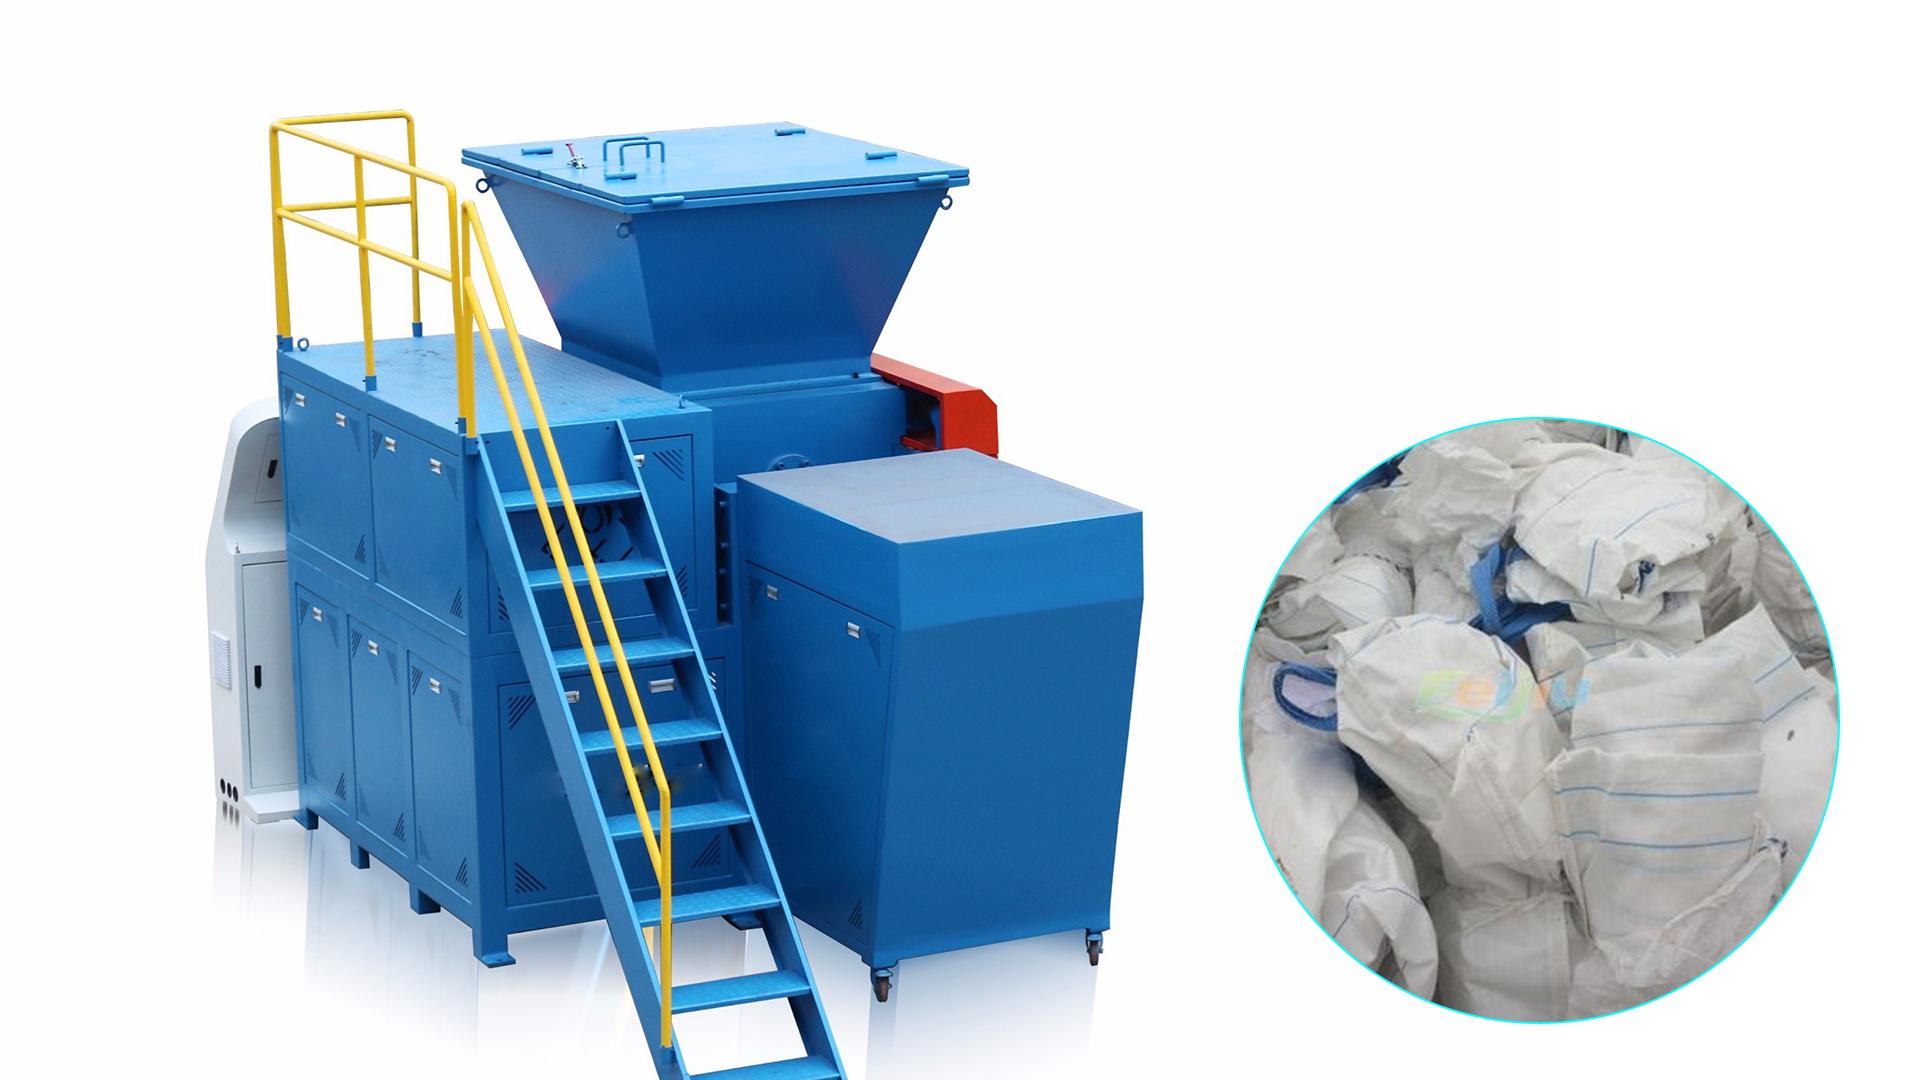 Professional Best Waste PP Bags Jumbo Bags Ton Bags Plastic Shredder Machine Factory Price-Elant manufacturers